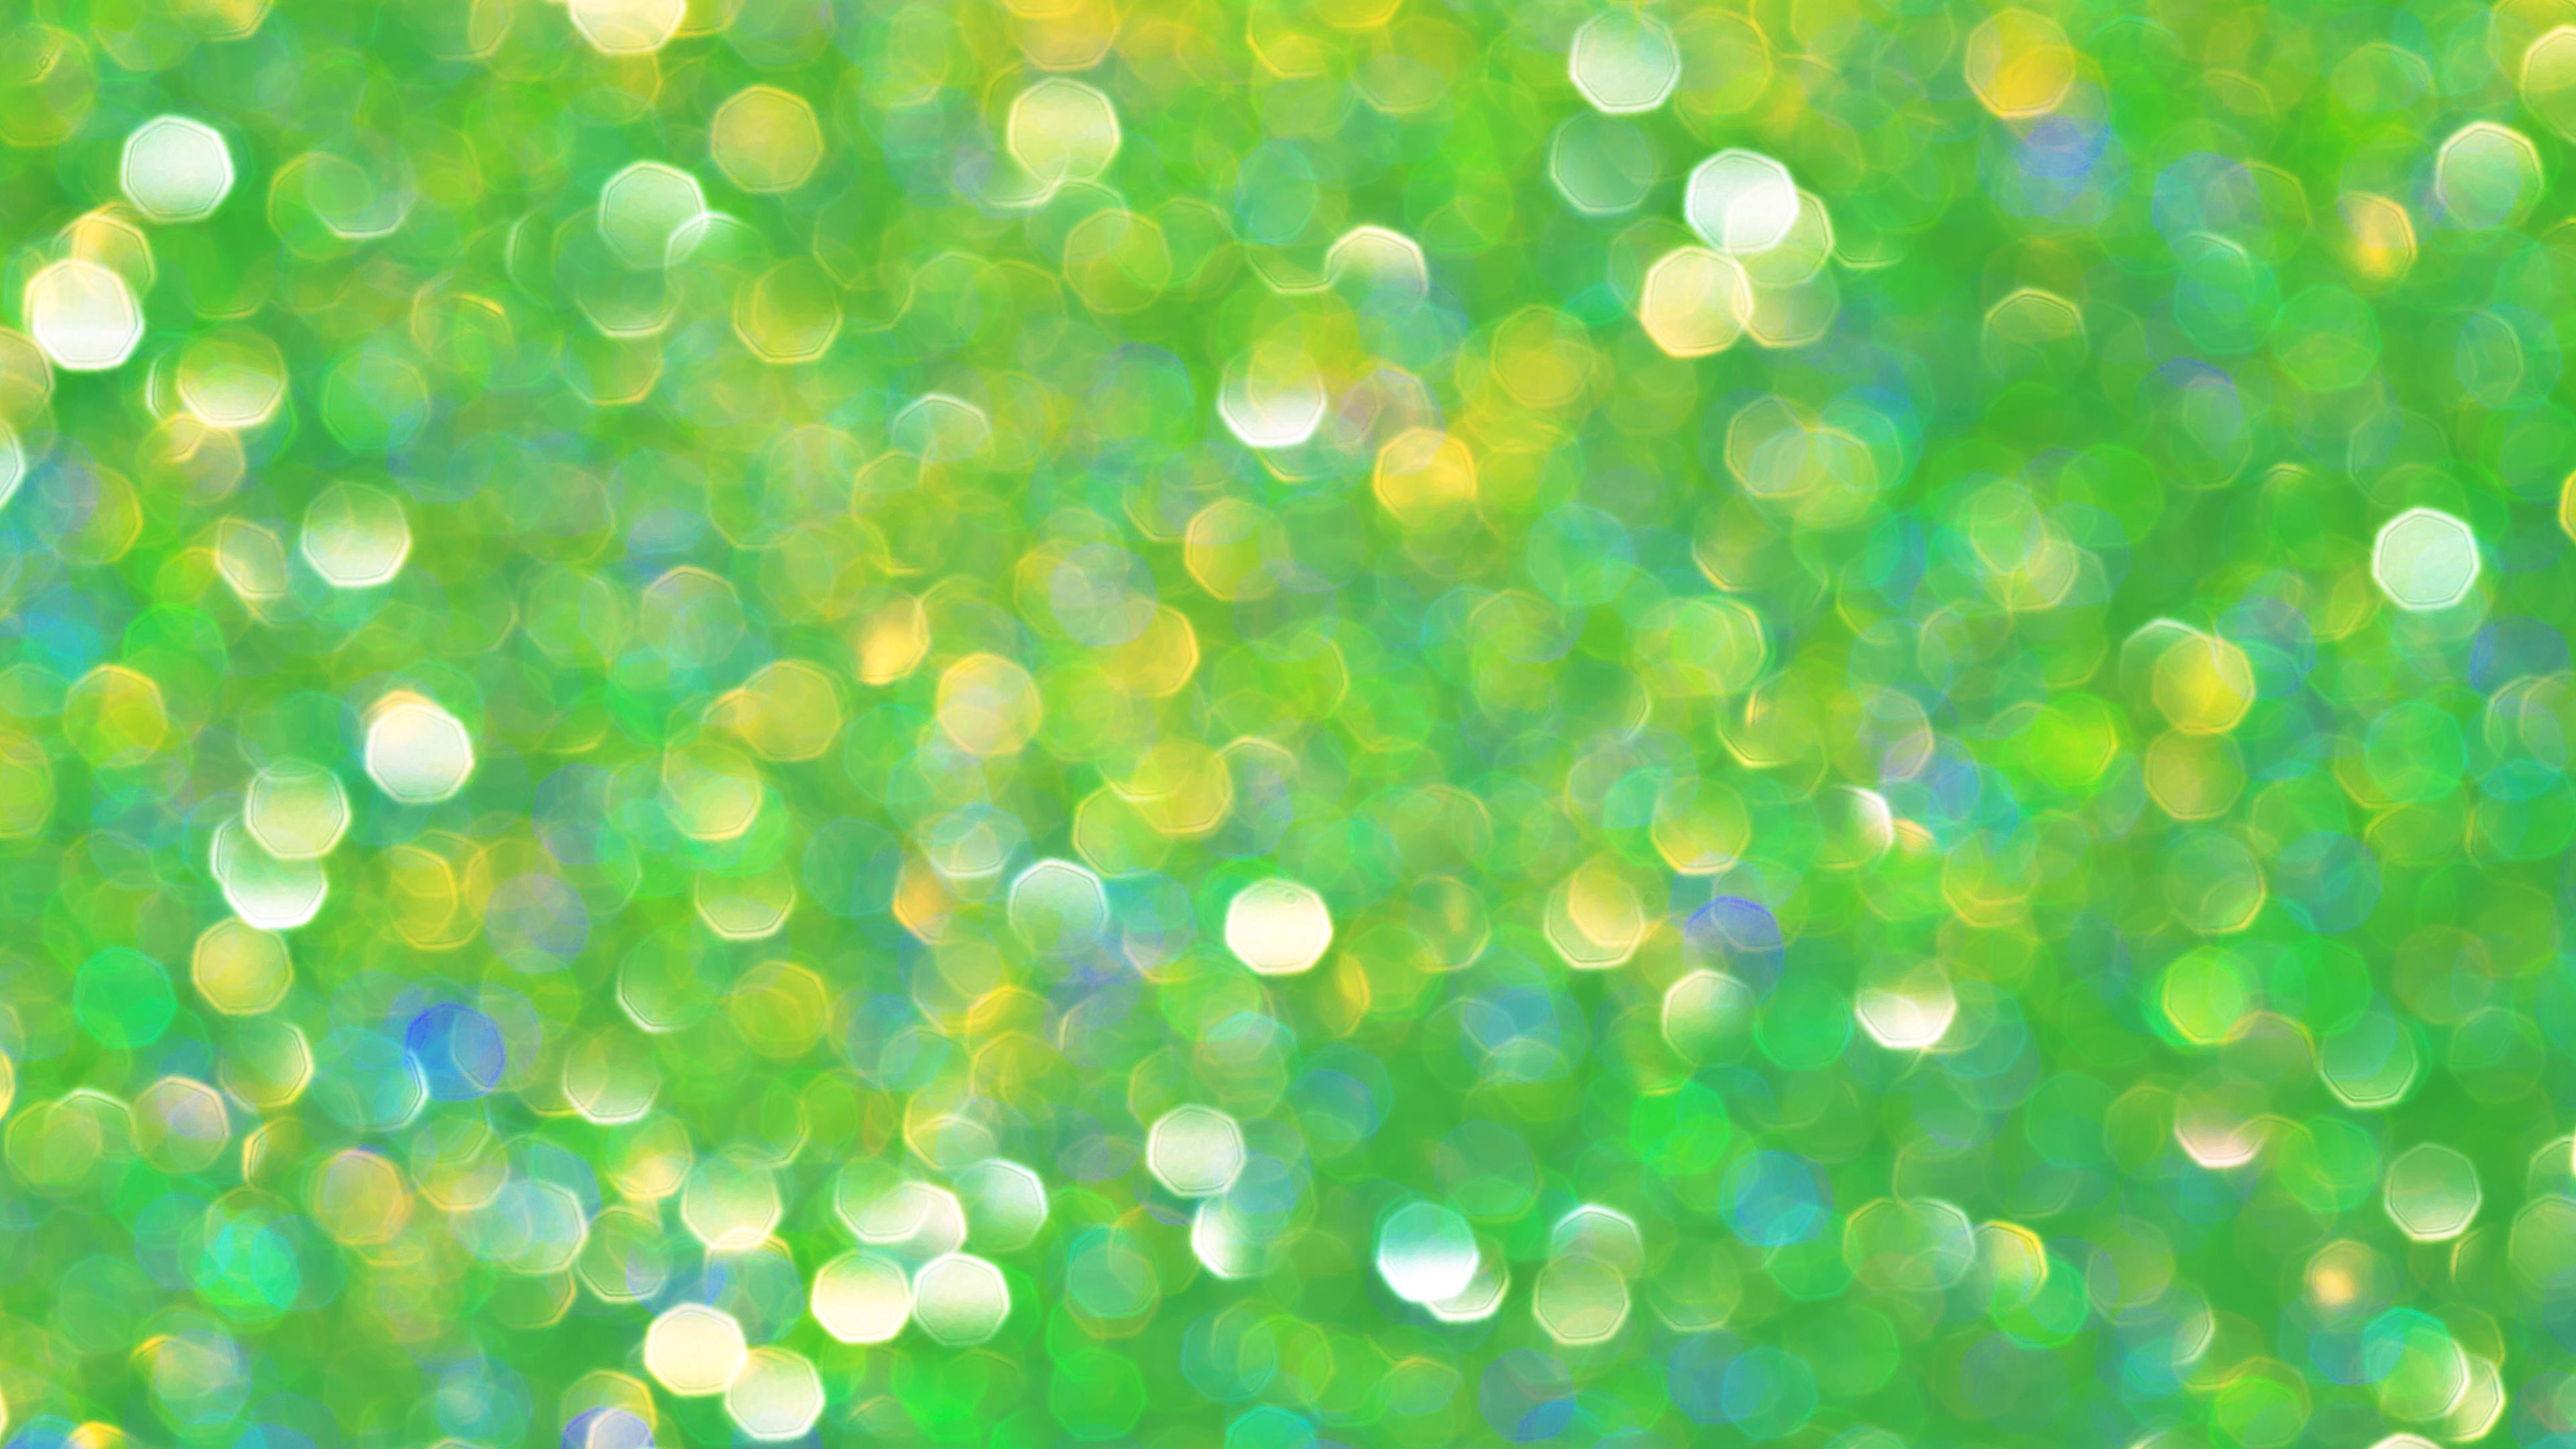 bokeh glare glitter circles green 4k 1539369880 - bokeh, glare, glitter, circles, green 4k - Glitter, glare, Bokeh